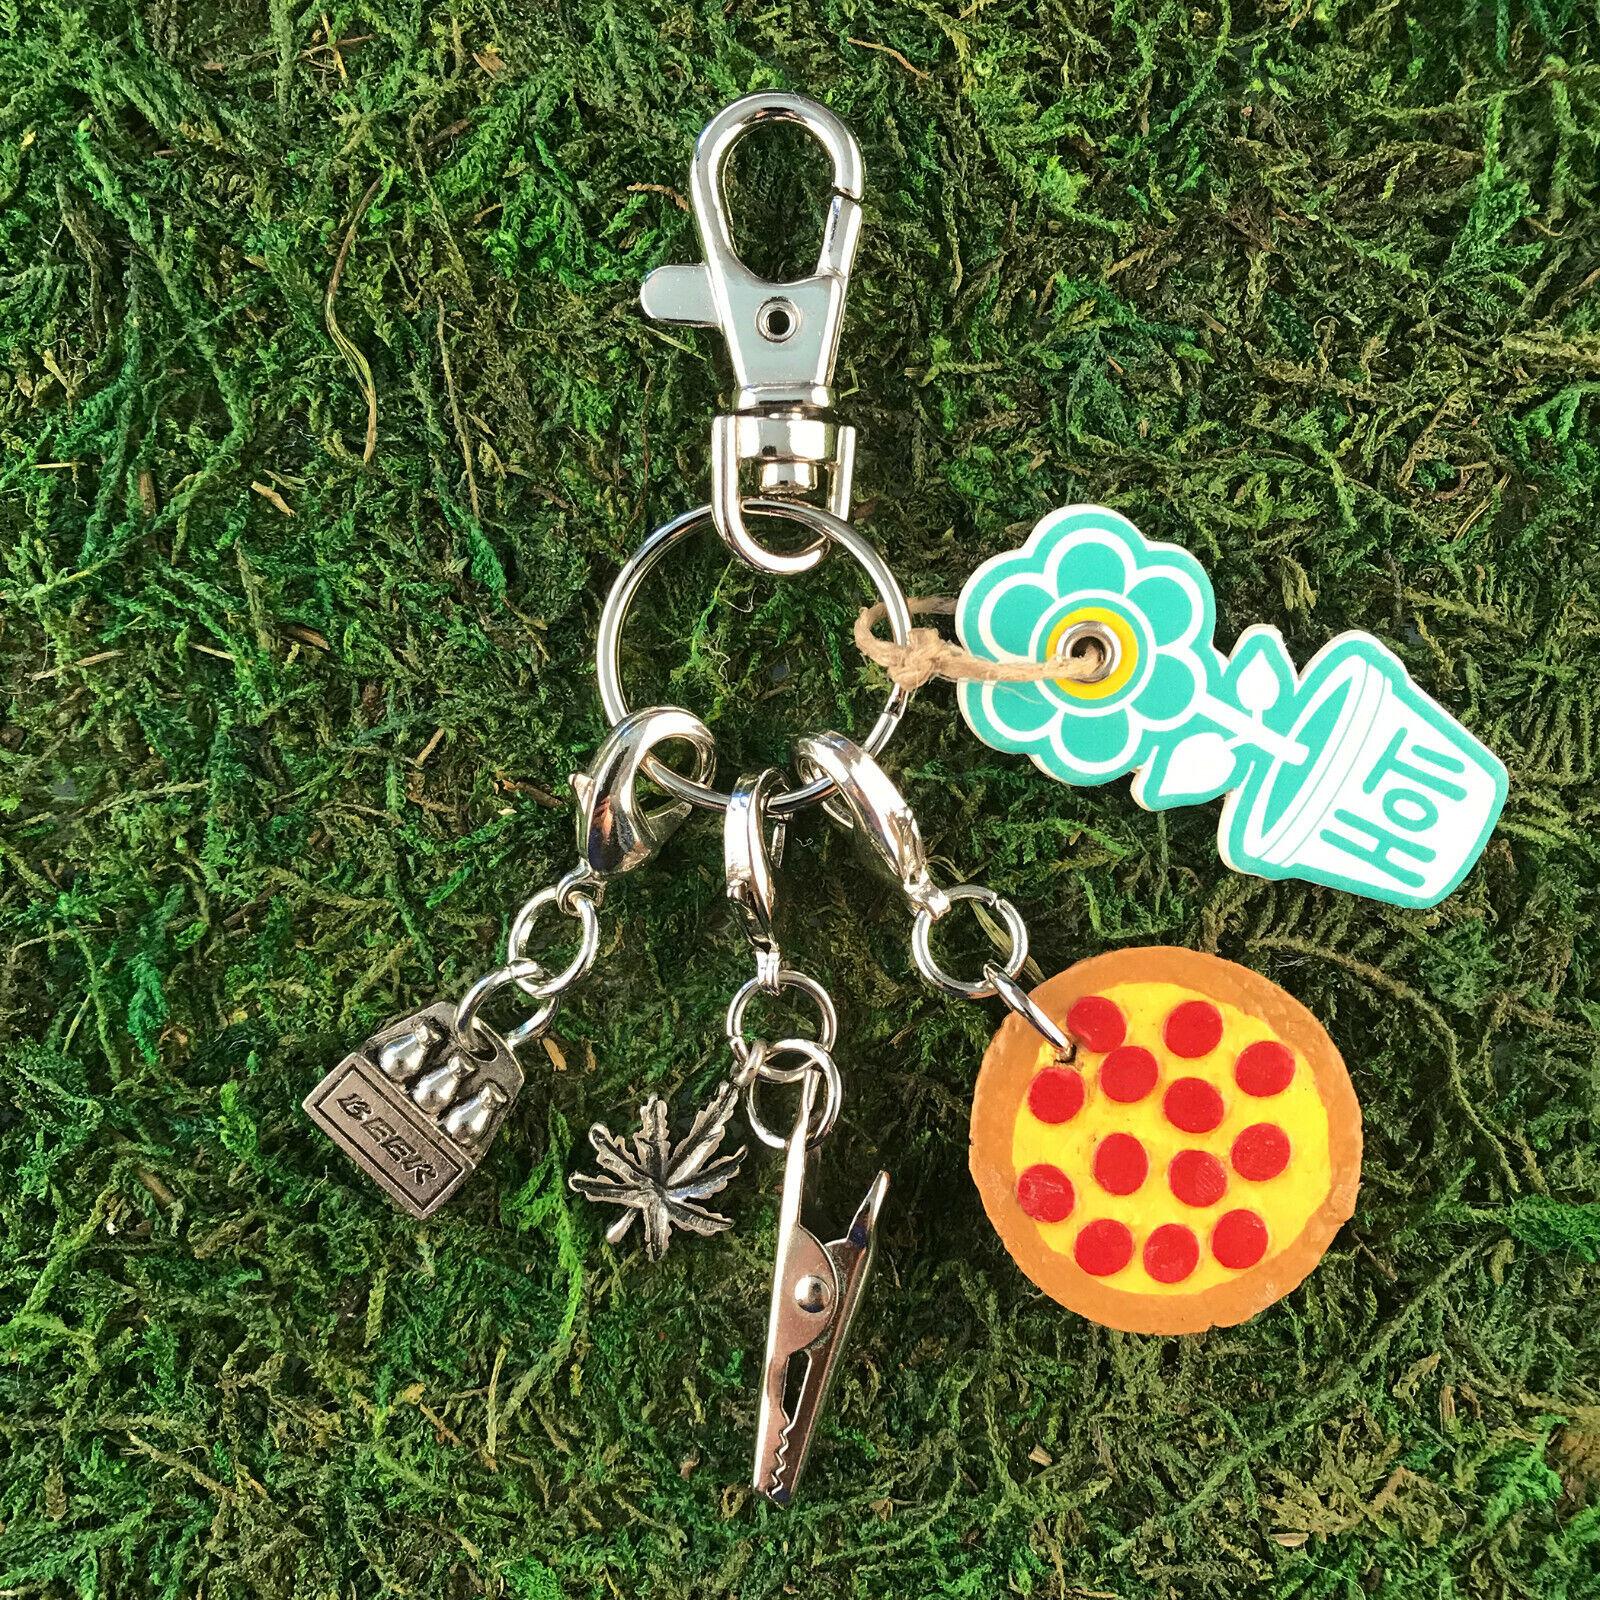 HOTI Handmade Pepperoni Pizza Beer Bottles Marijuana Leaf Roach Clip Keychain